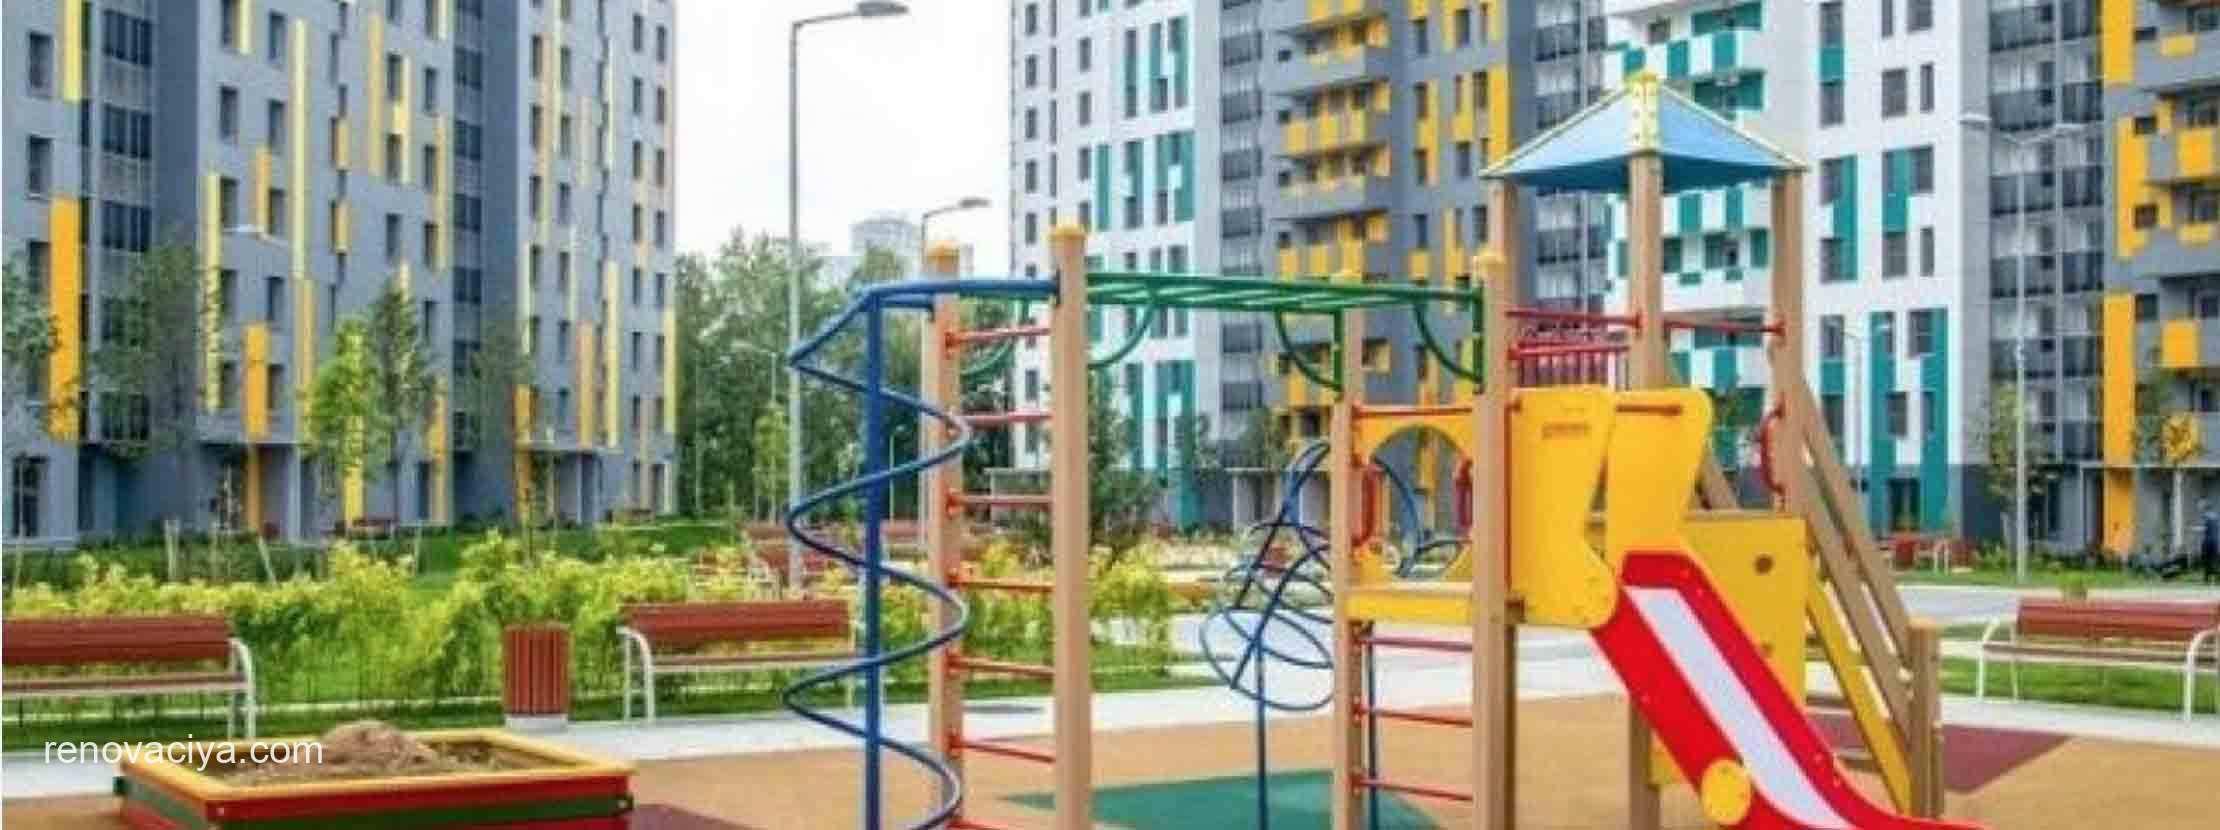 в Свиблово построят школу и детский сад